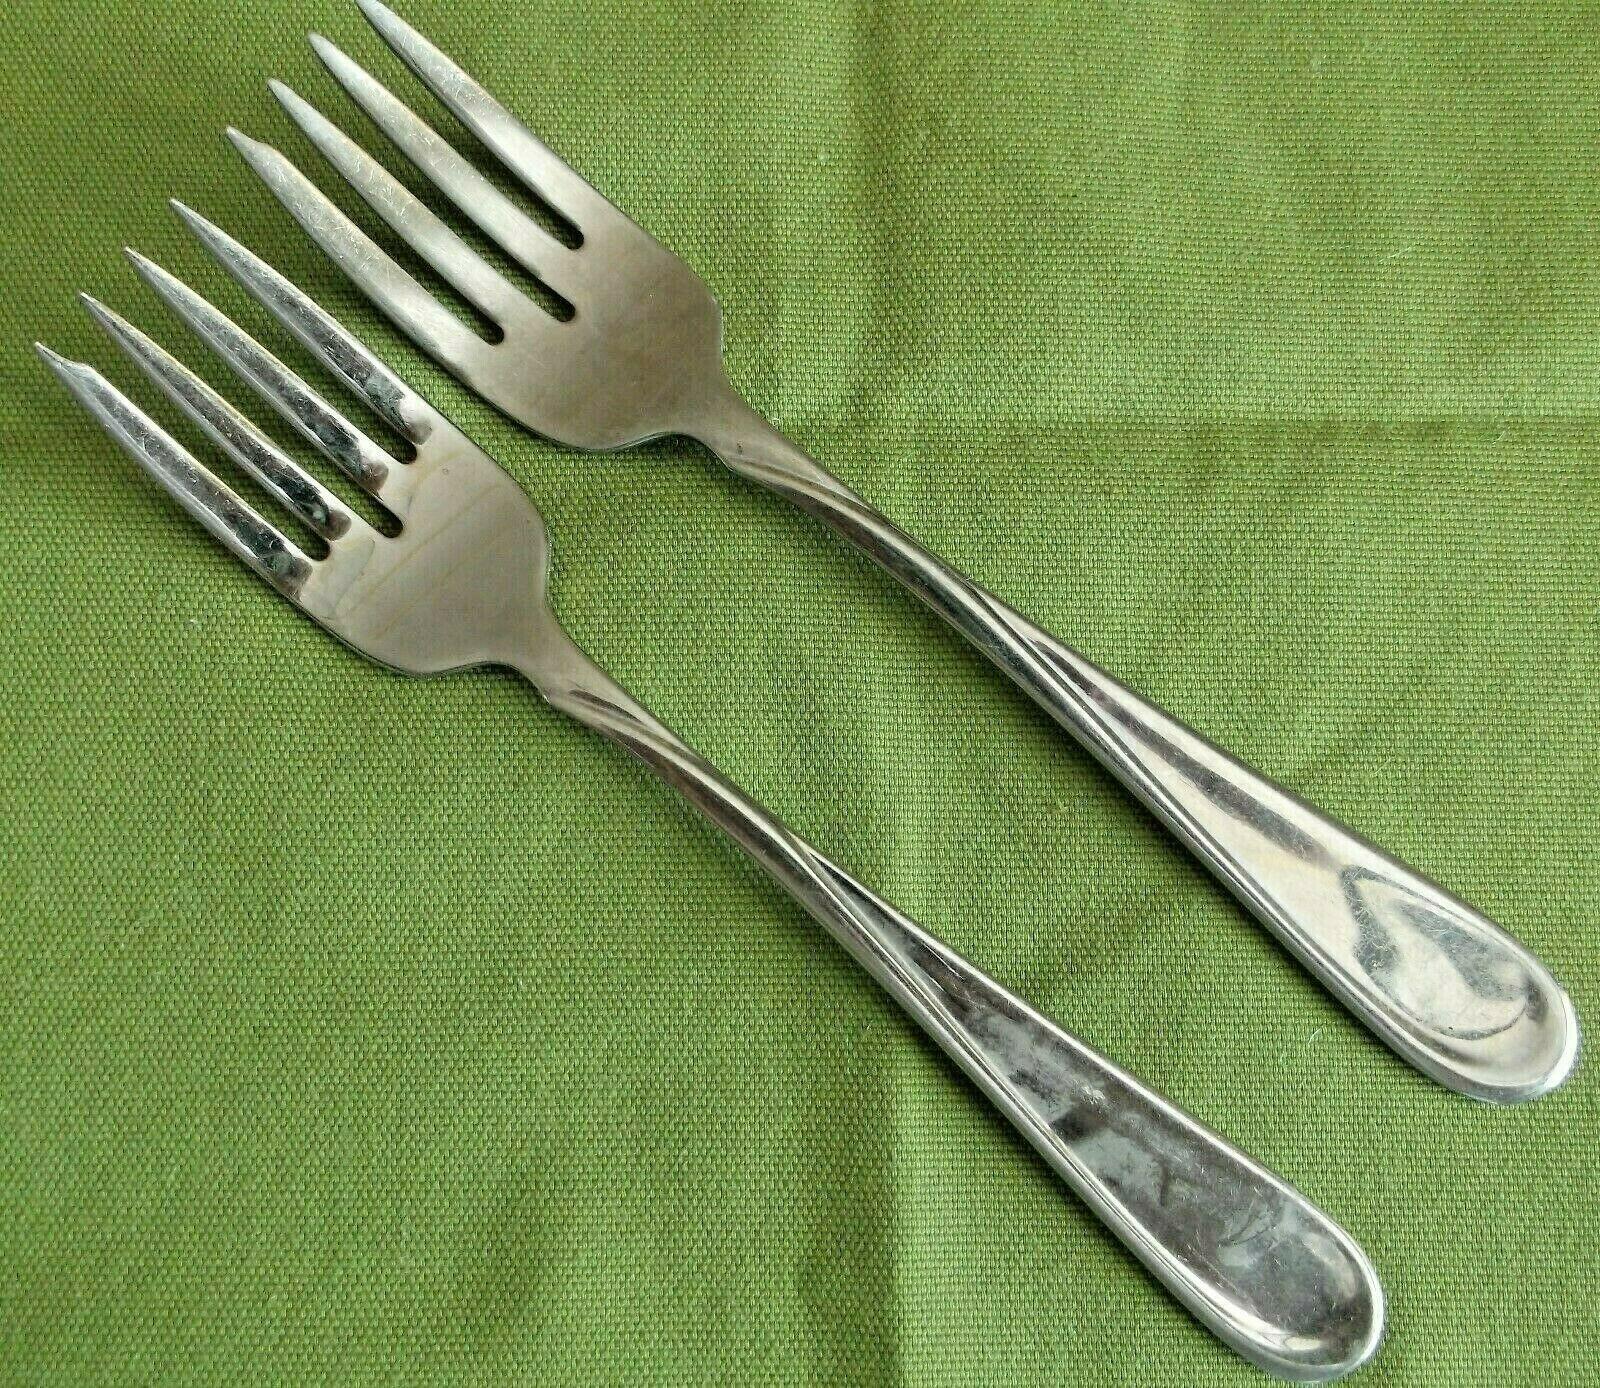 "8 Salad Forks Oneida Flight Reliance Glossy Flatware Stainless 6 3//4/"""